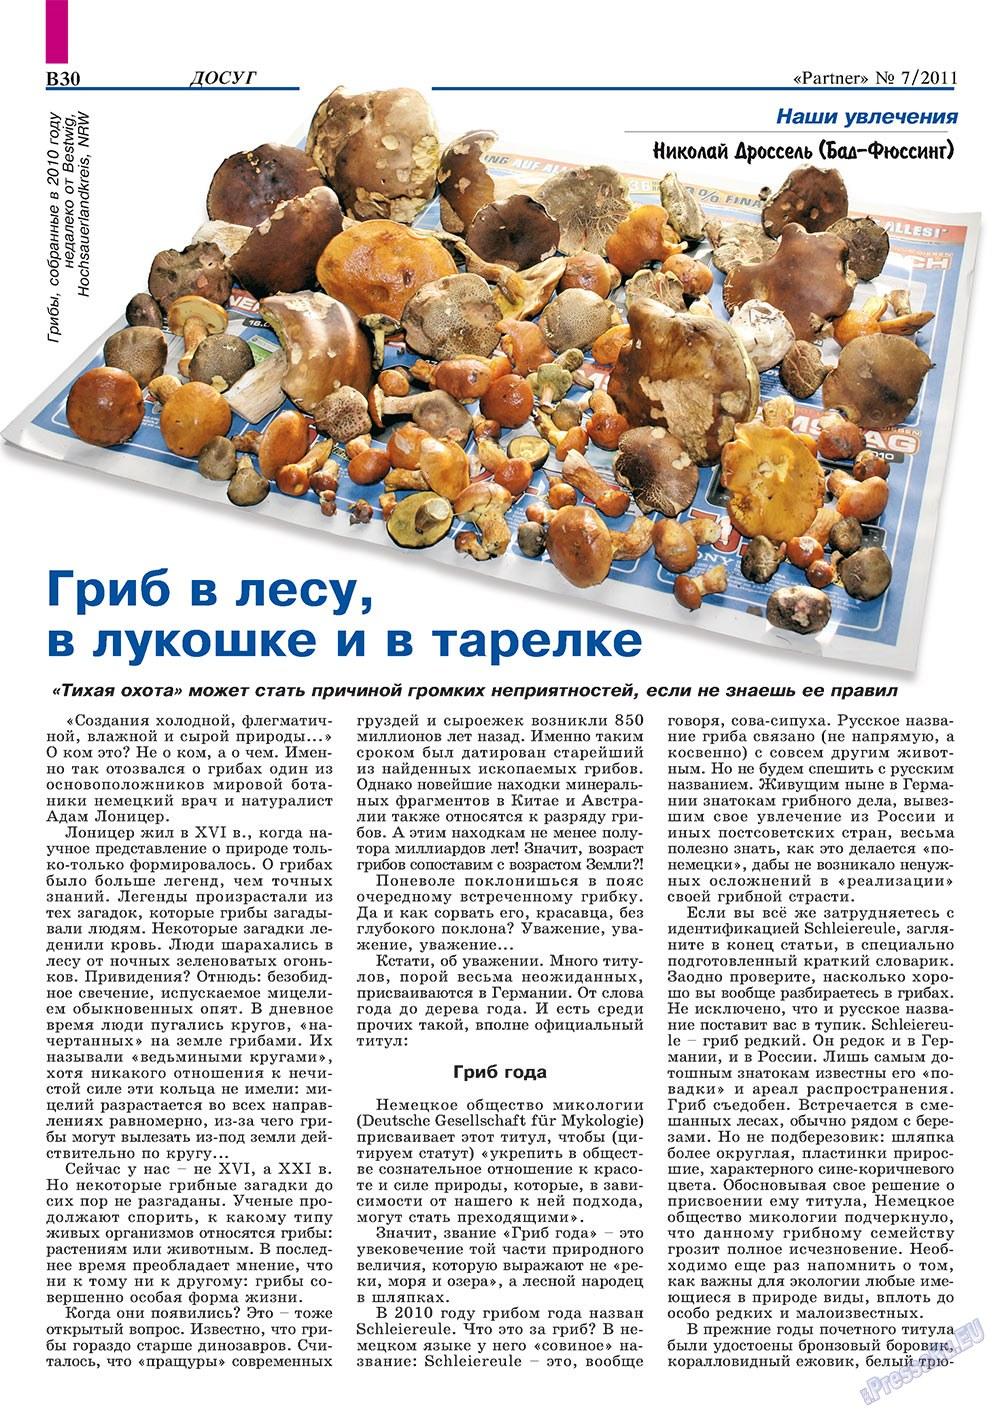 Партнер-север (журнал). 2011 год, номер 7, стр. 40